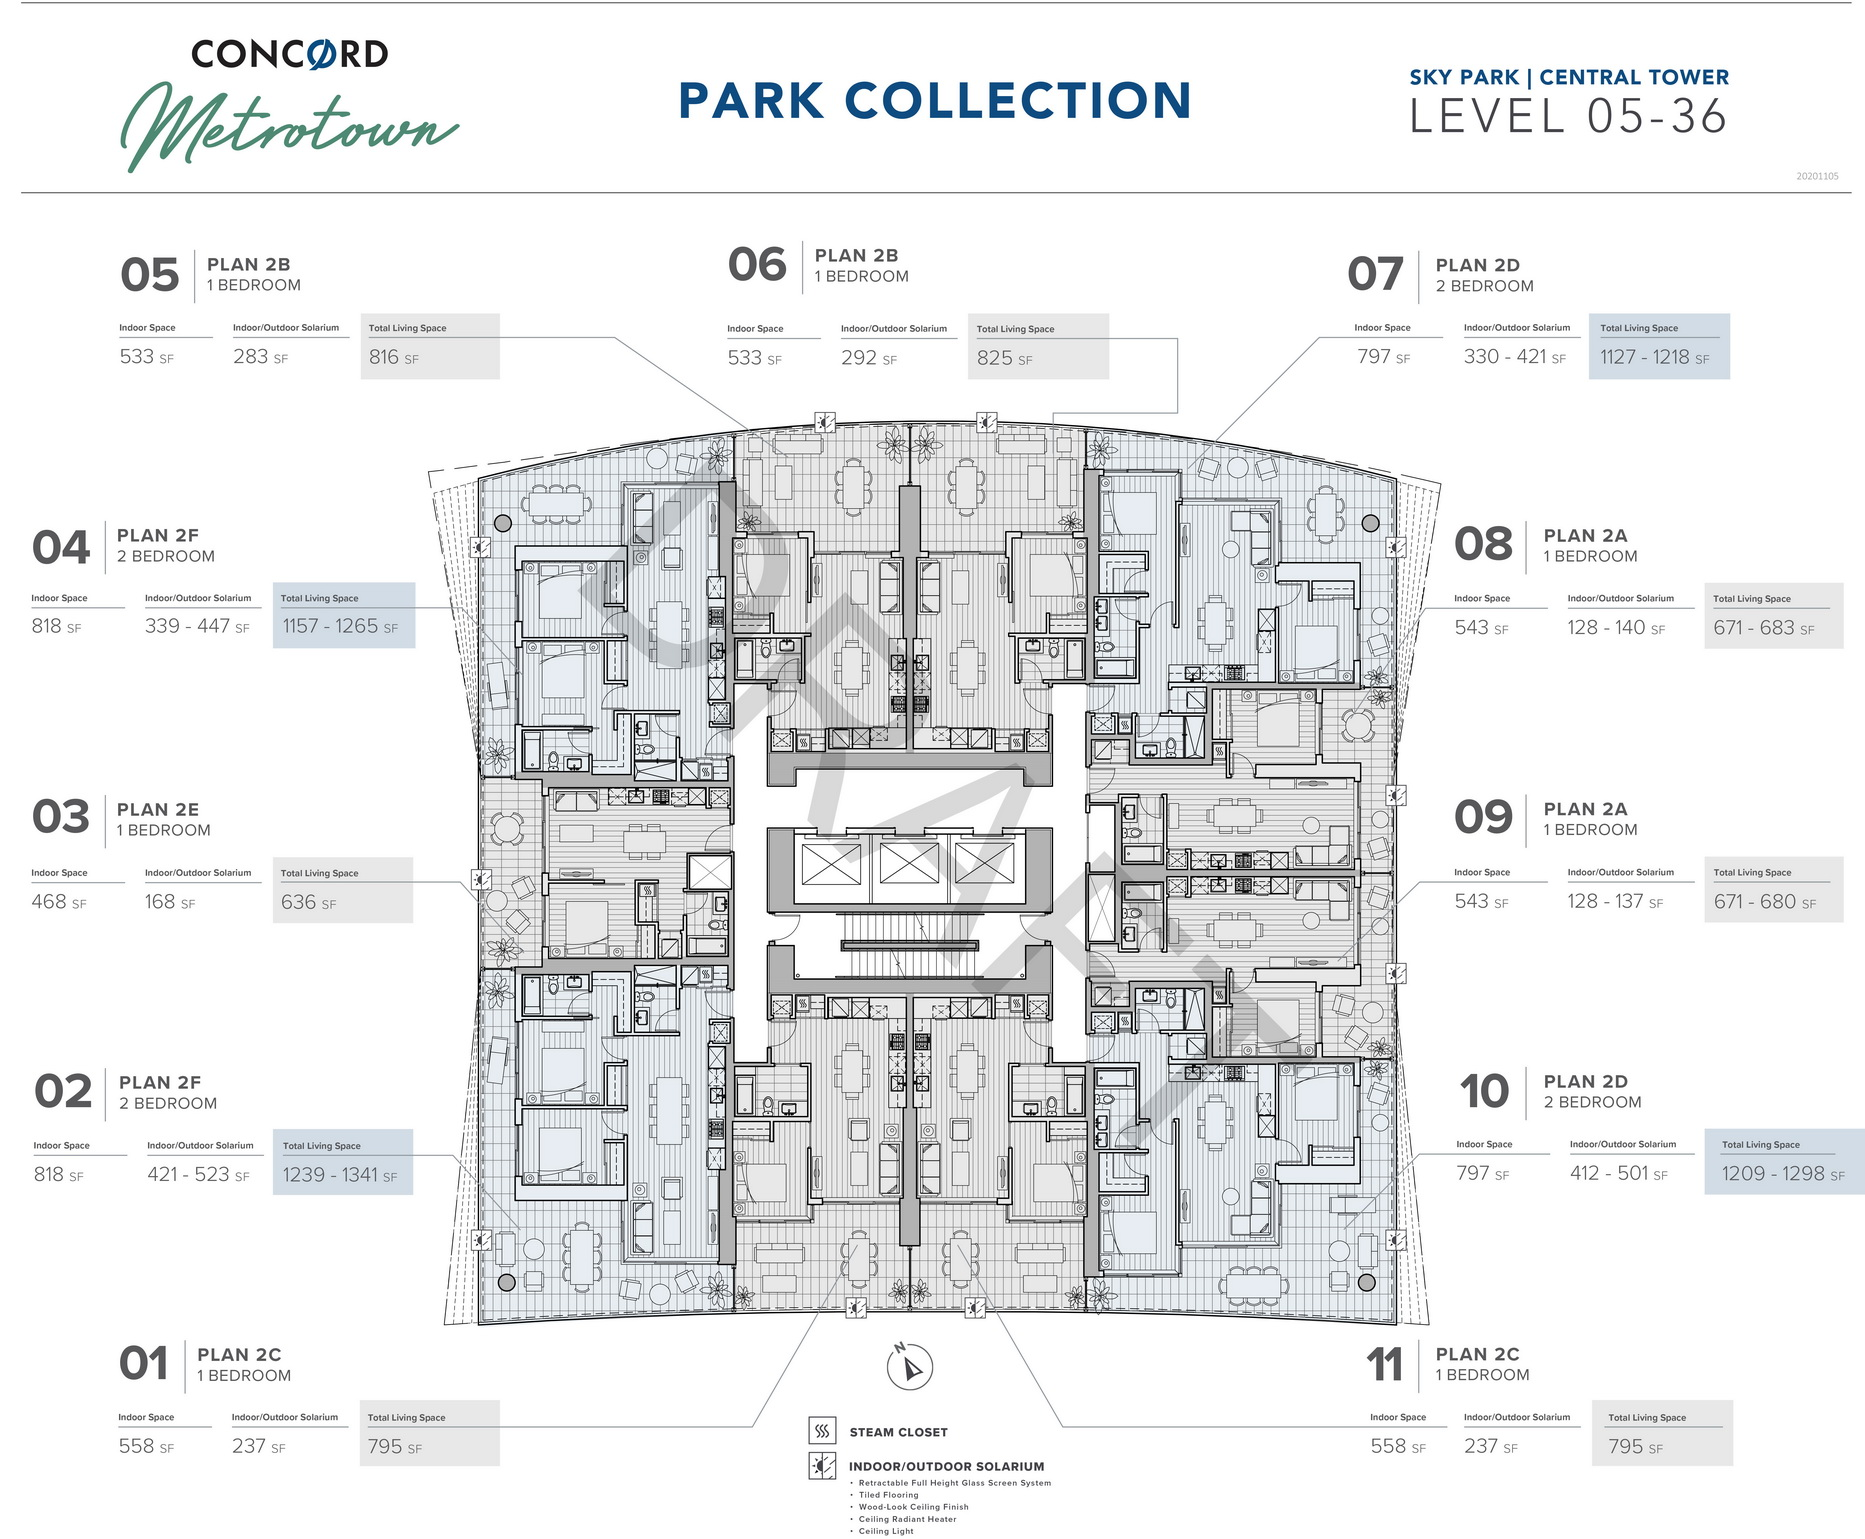 cm t2 floorplate 20201105 5 36 level